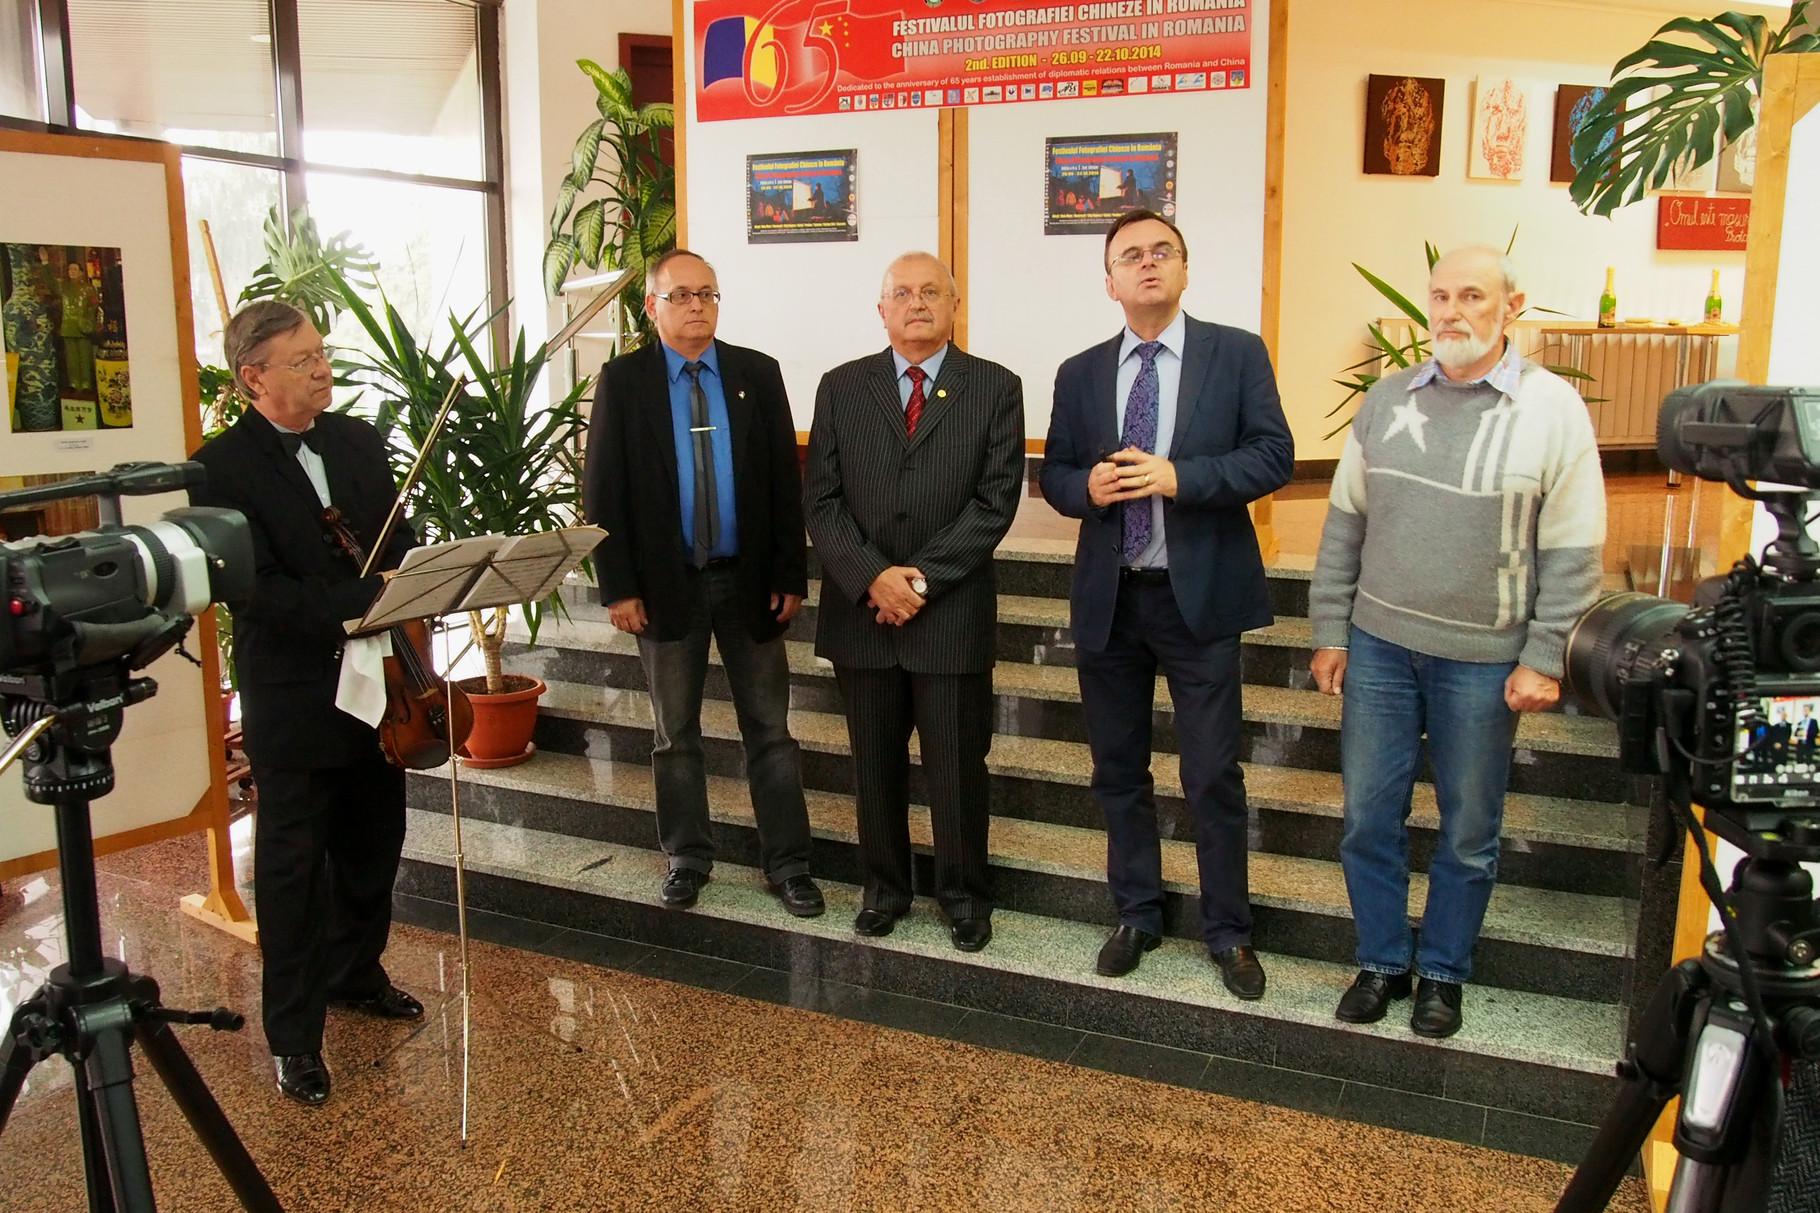 22.10.2014 - Baia Mare (RO)